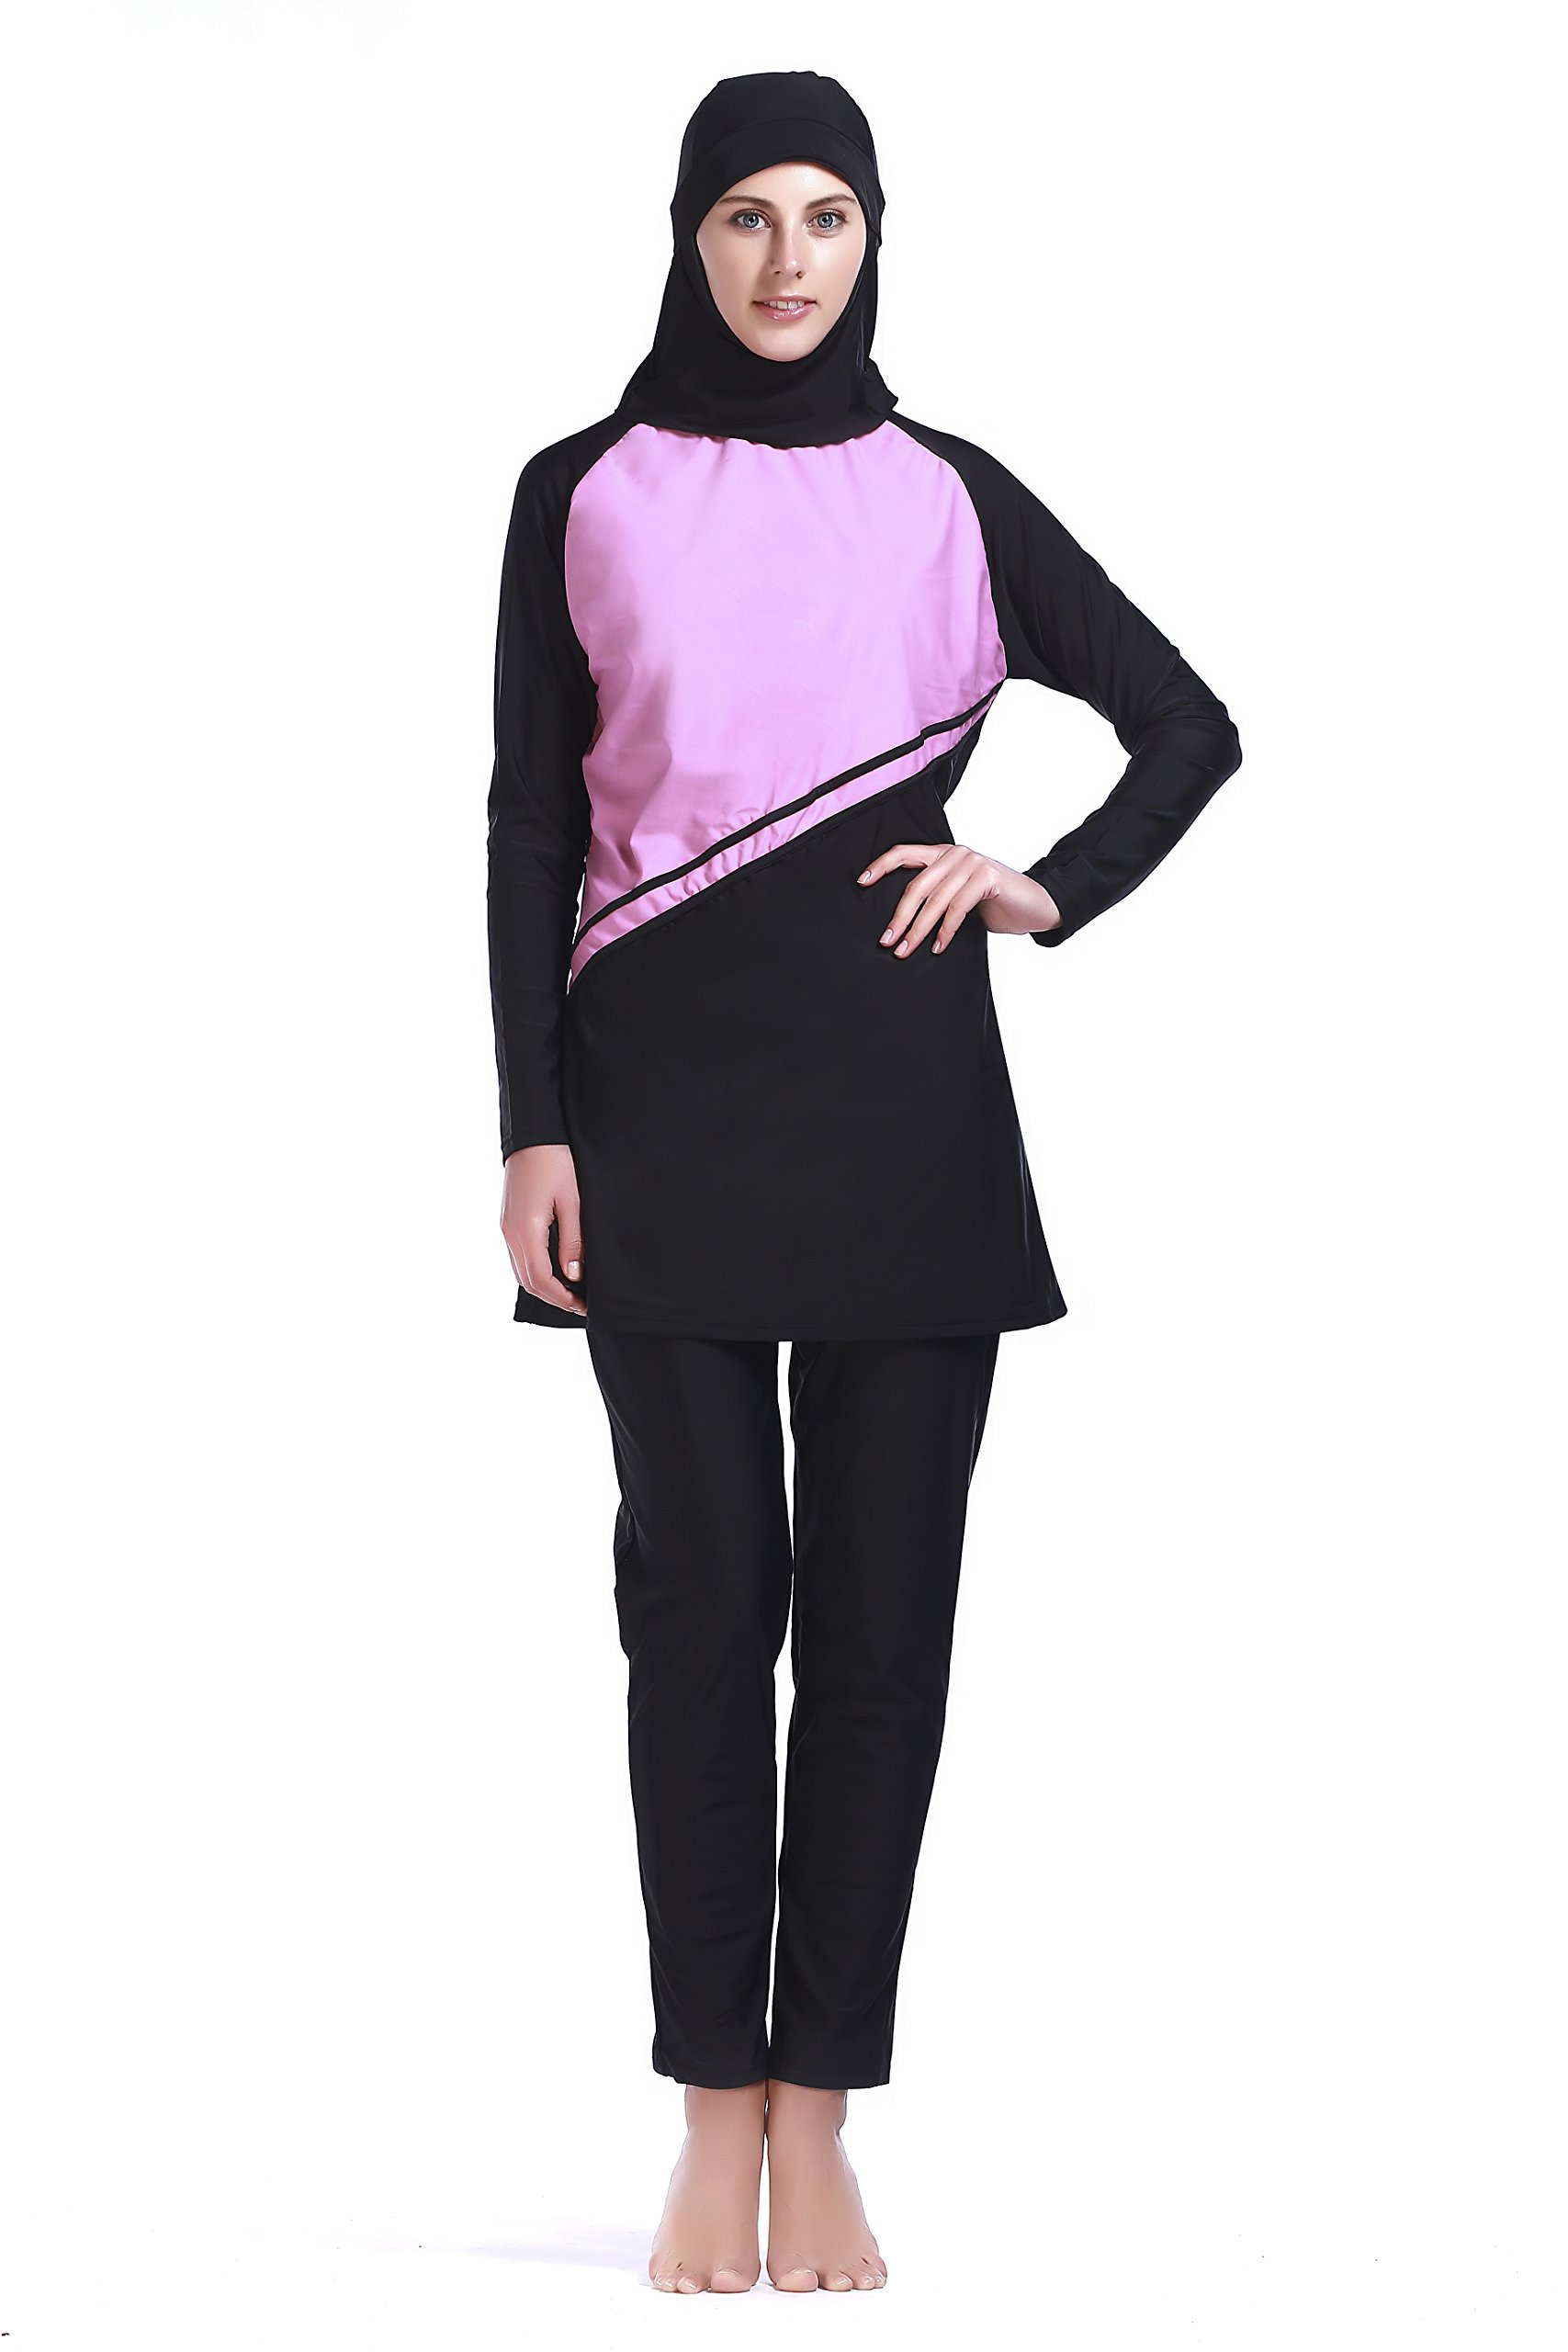 MZ Garment Muslim Swimwear Women Islamic Hijab Modesty Modest Swimsuit Costume (XXL, MS030)